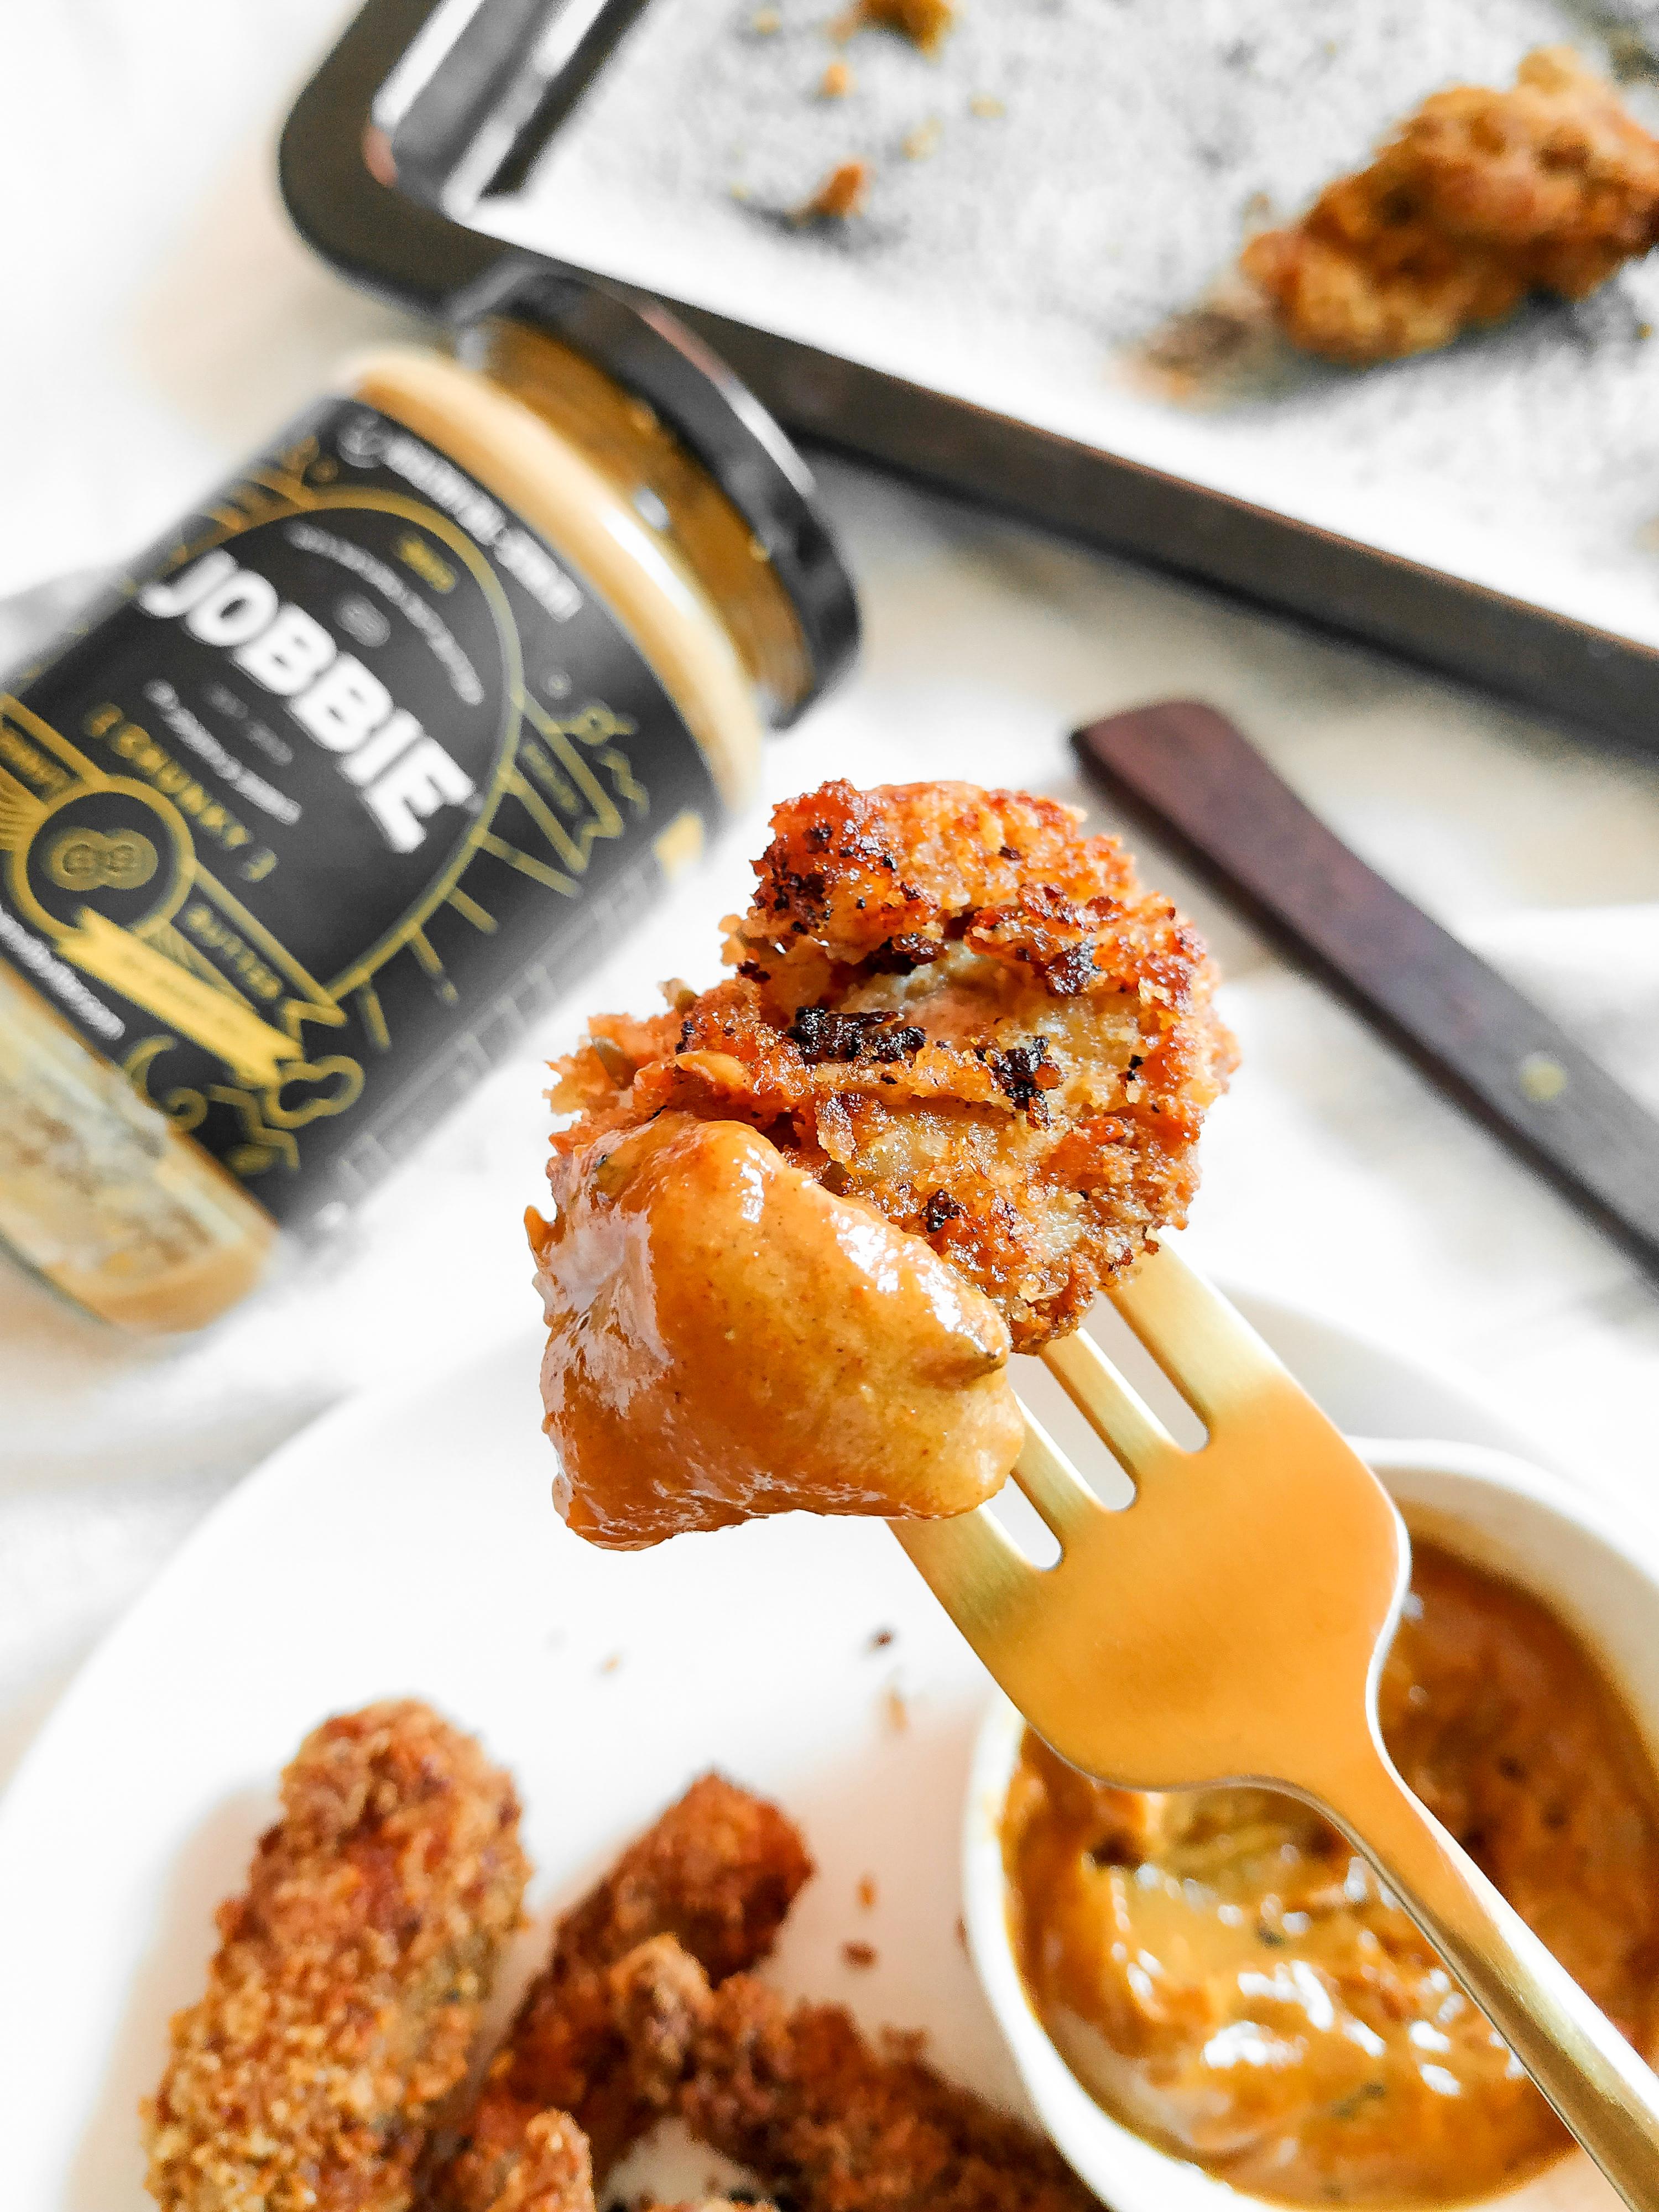 JOBBIE Peanut Butter Dry Curry Chicken Katsu Strips Japanese Fried Chicken